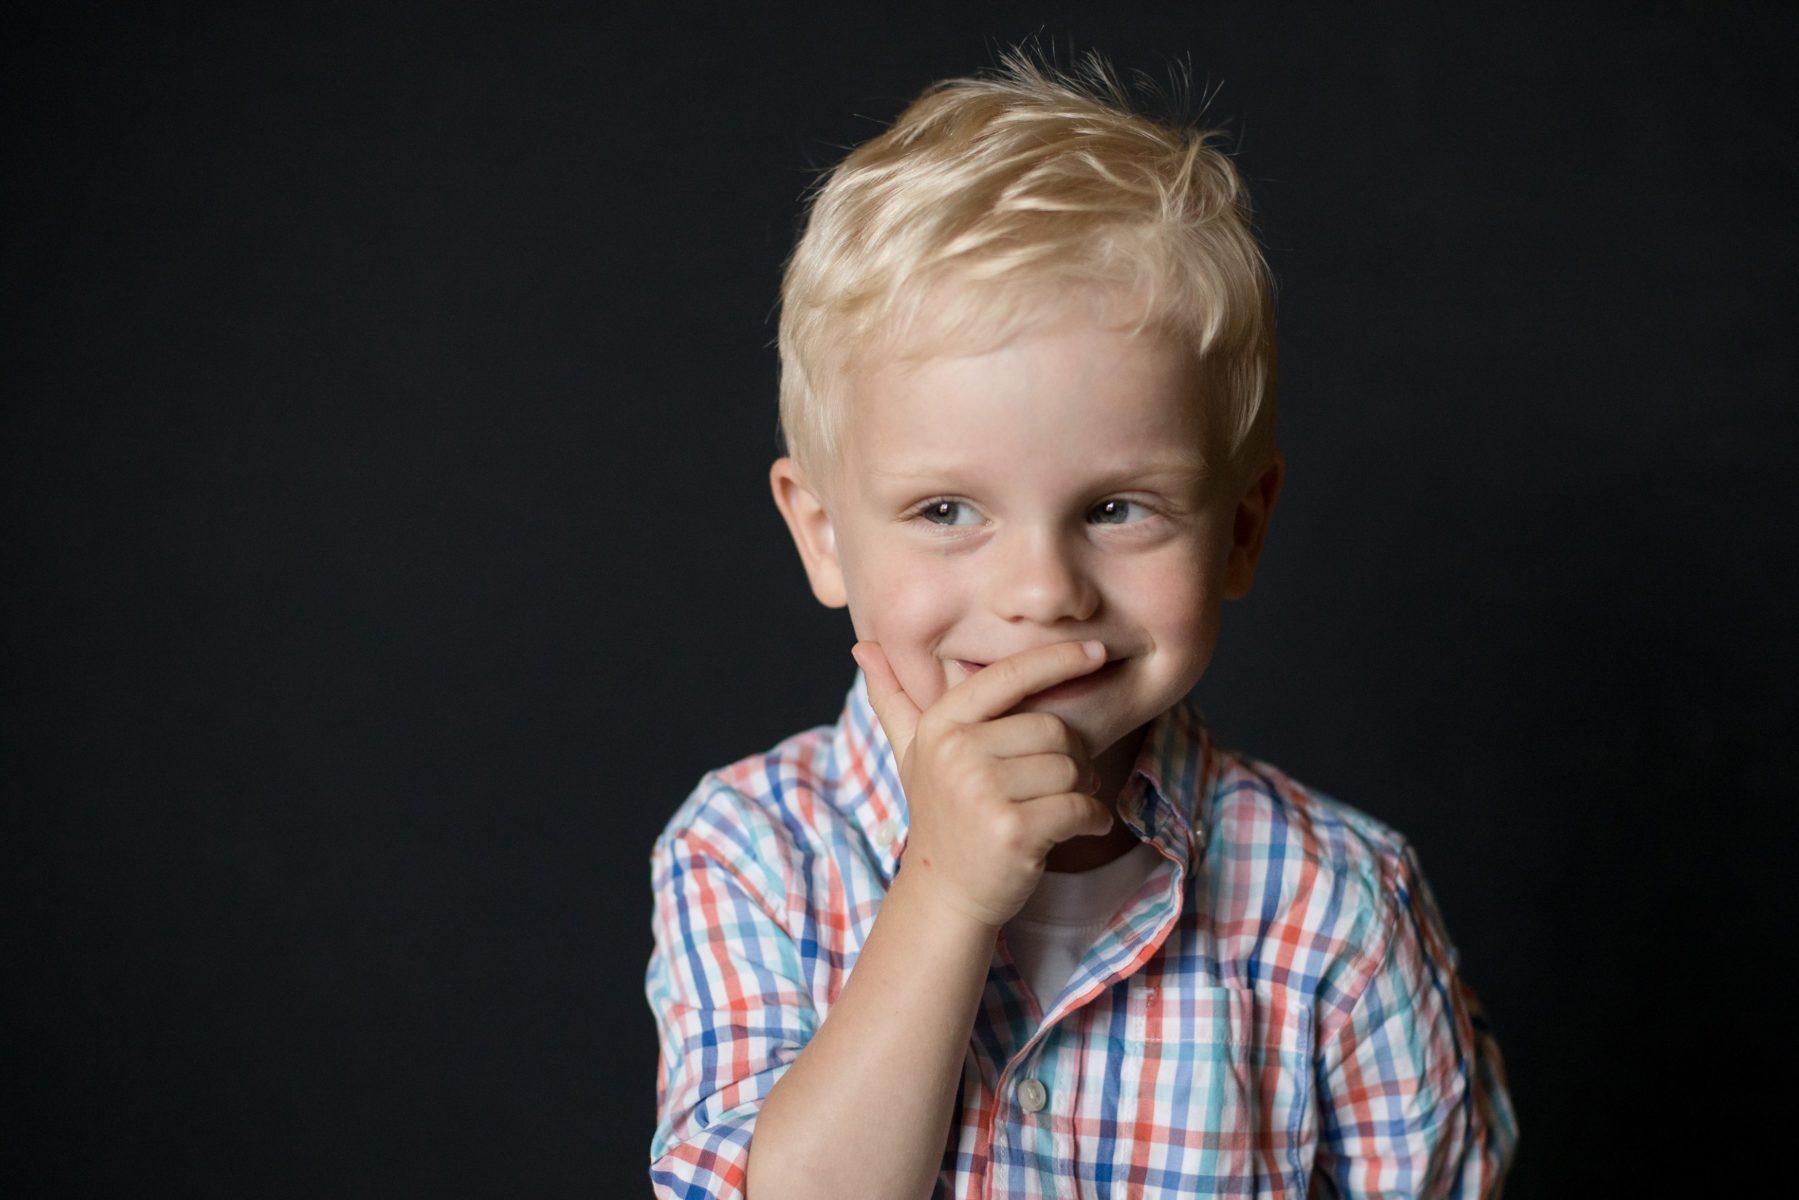 Modern School Portraits (Shelly Niehaus|Child Photographer Prosper, TX}